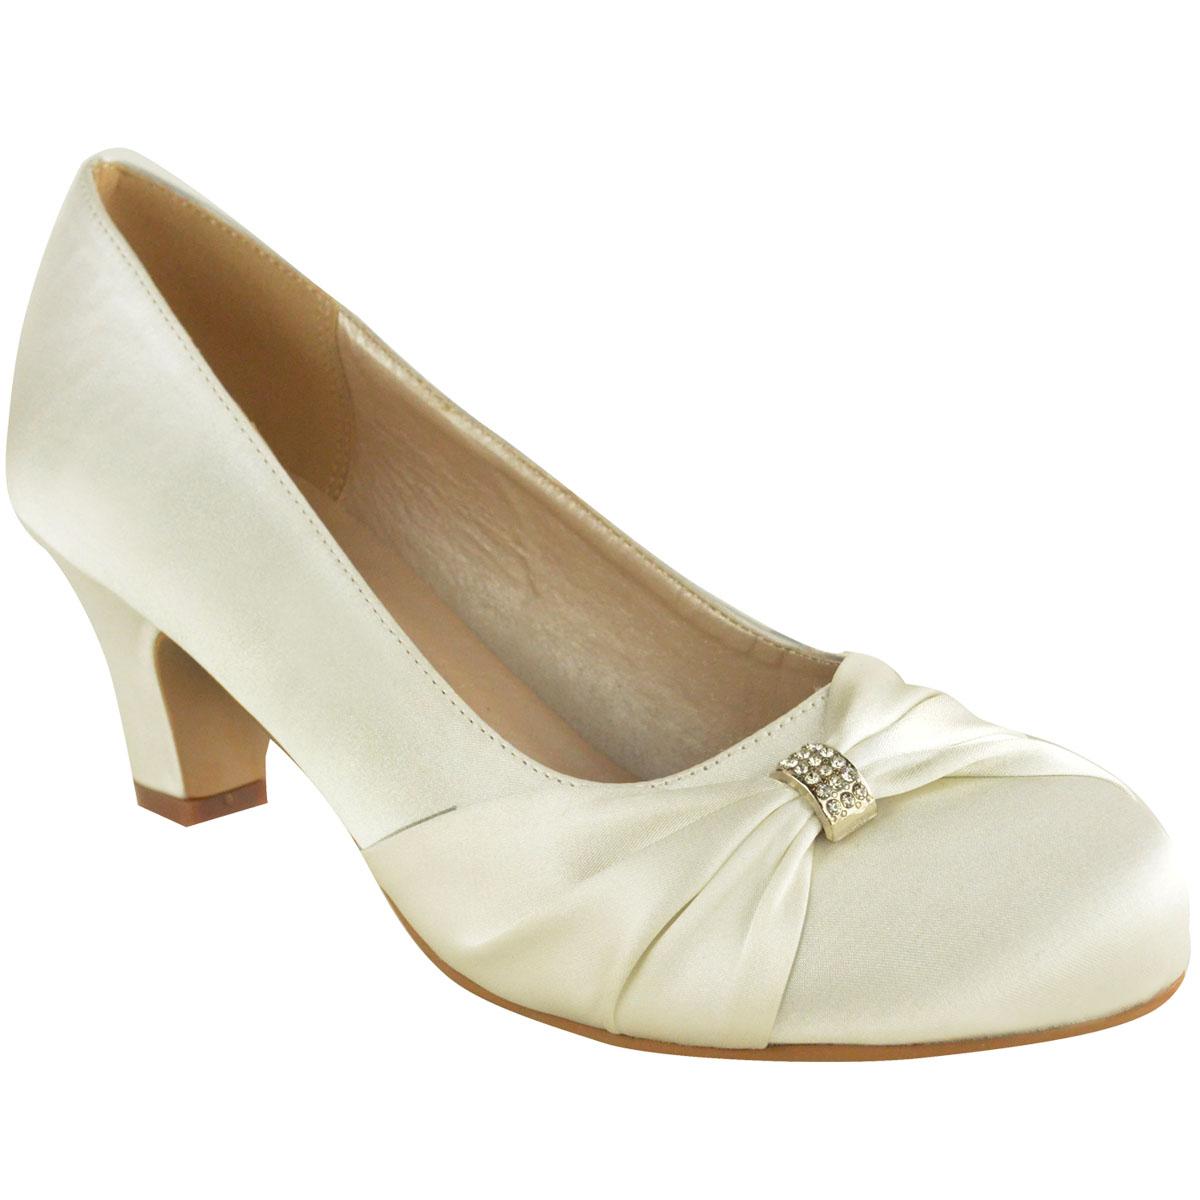 Womens Wedding Shoes: Womens Wedding Shoes Ladies Low Mid Heels Bridal